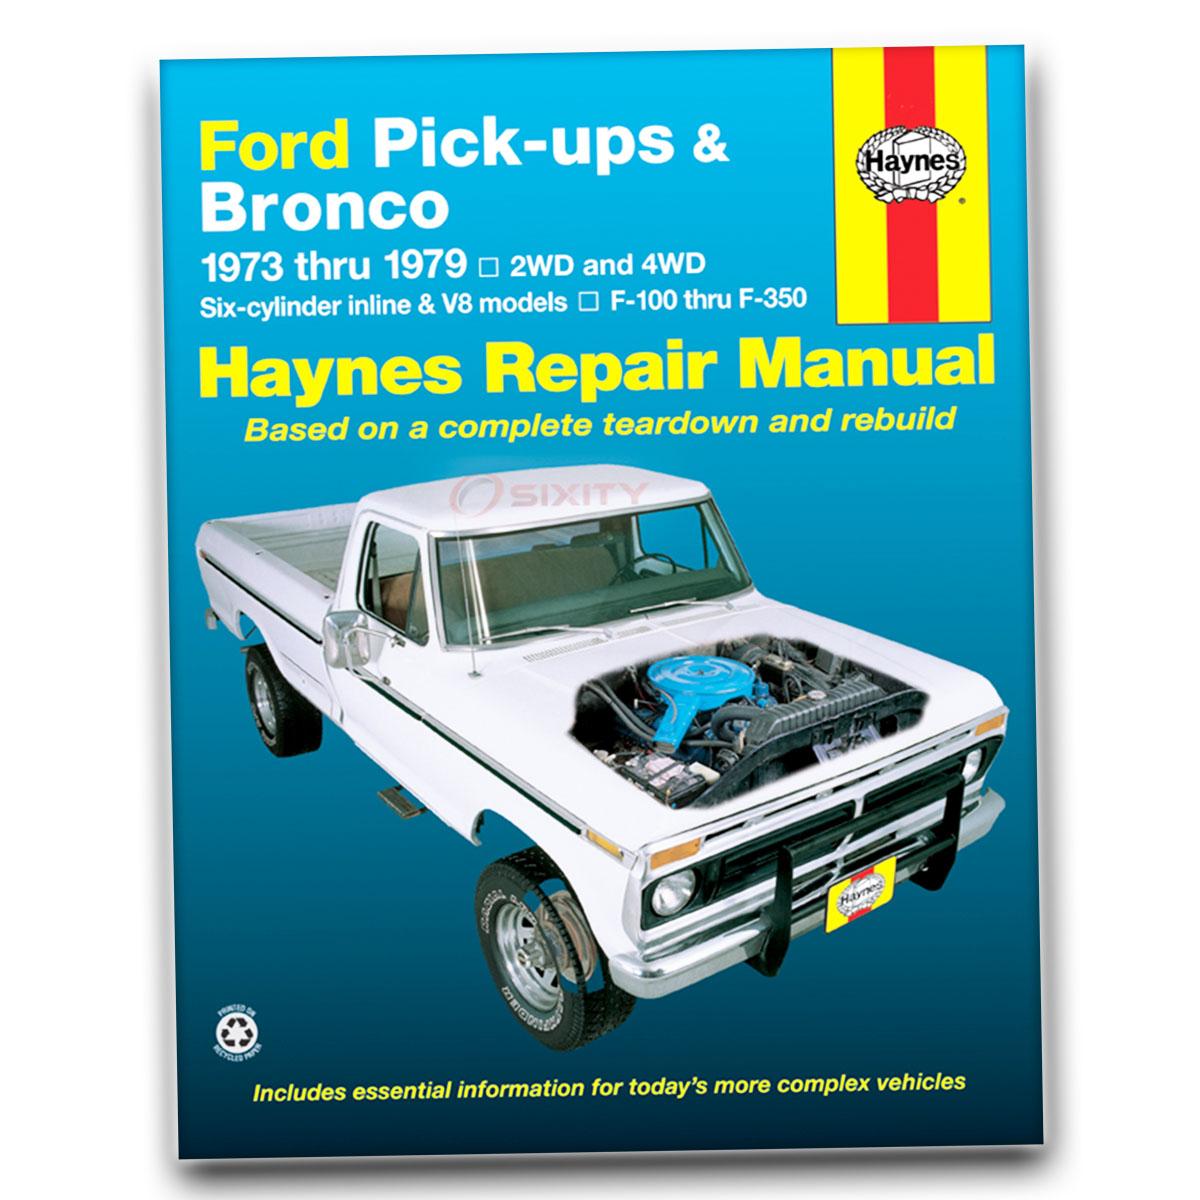 Haynes Repair Manual 36054 for Ford Pick-up Bronco 73-79 Shop Service  Garage lq